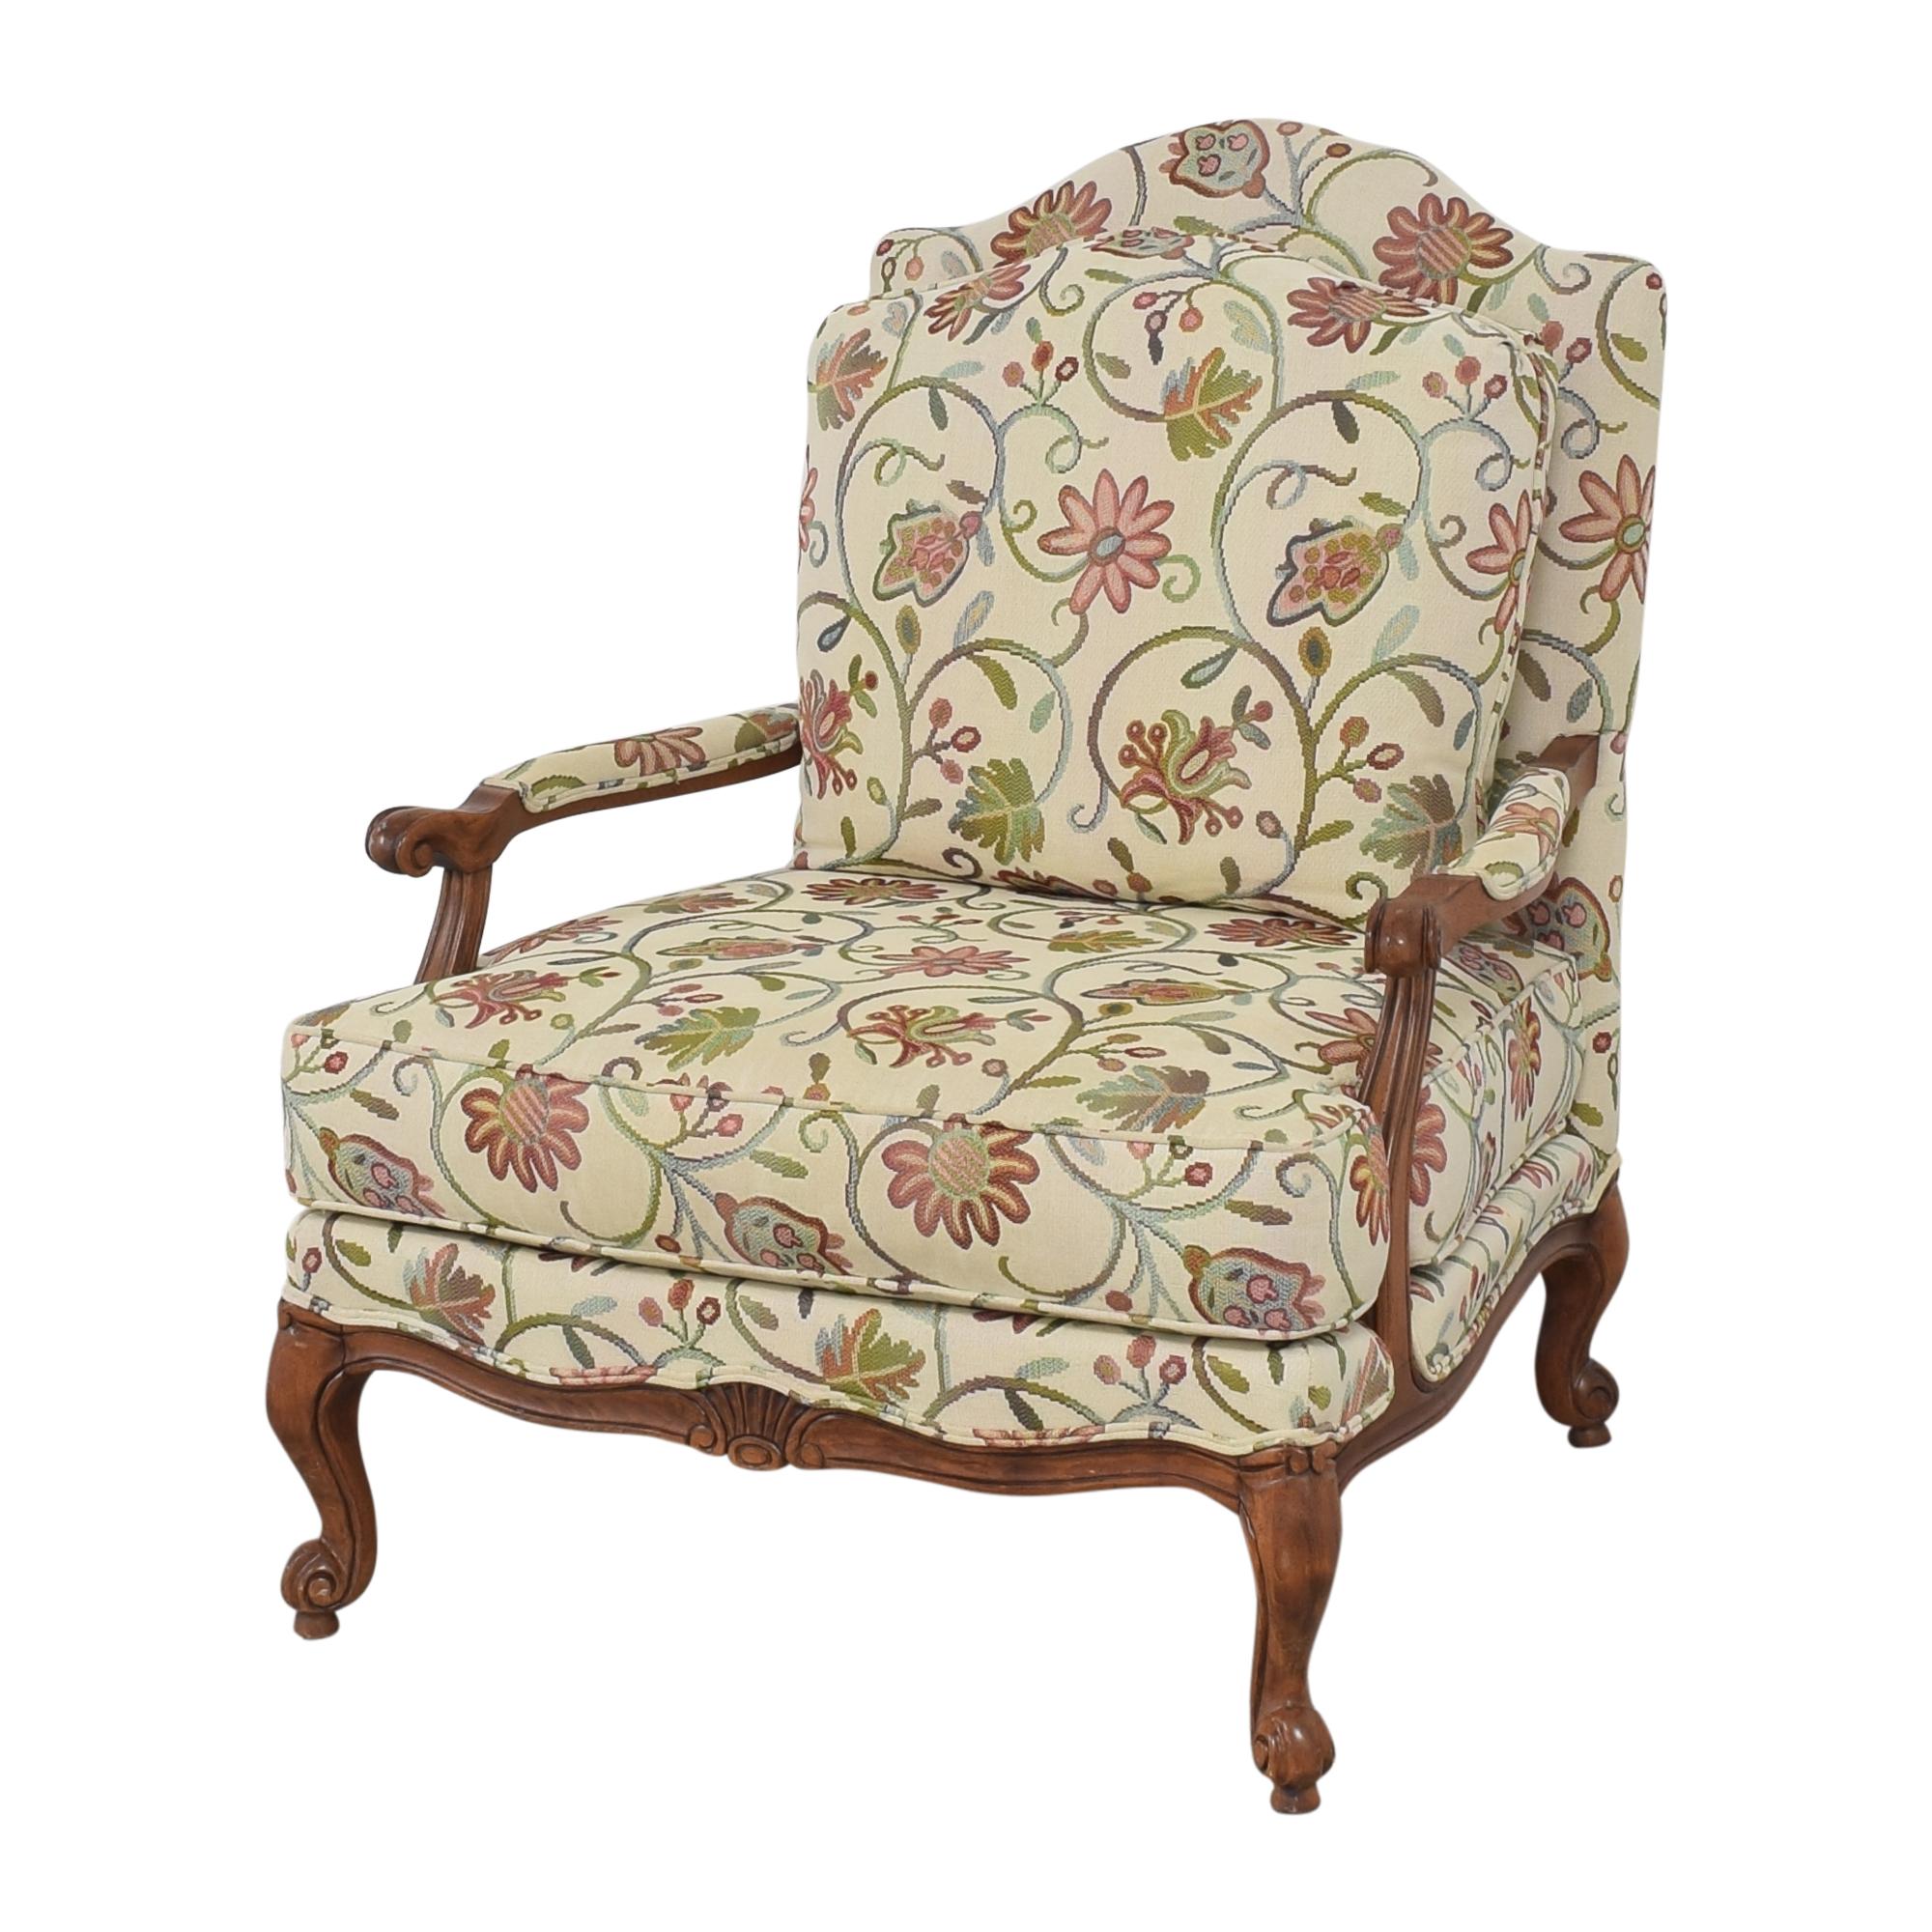 Ethan Allen Ethan Allen Harris Floral Chair Accent Chairs